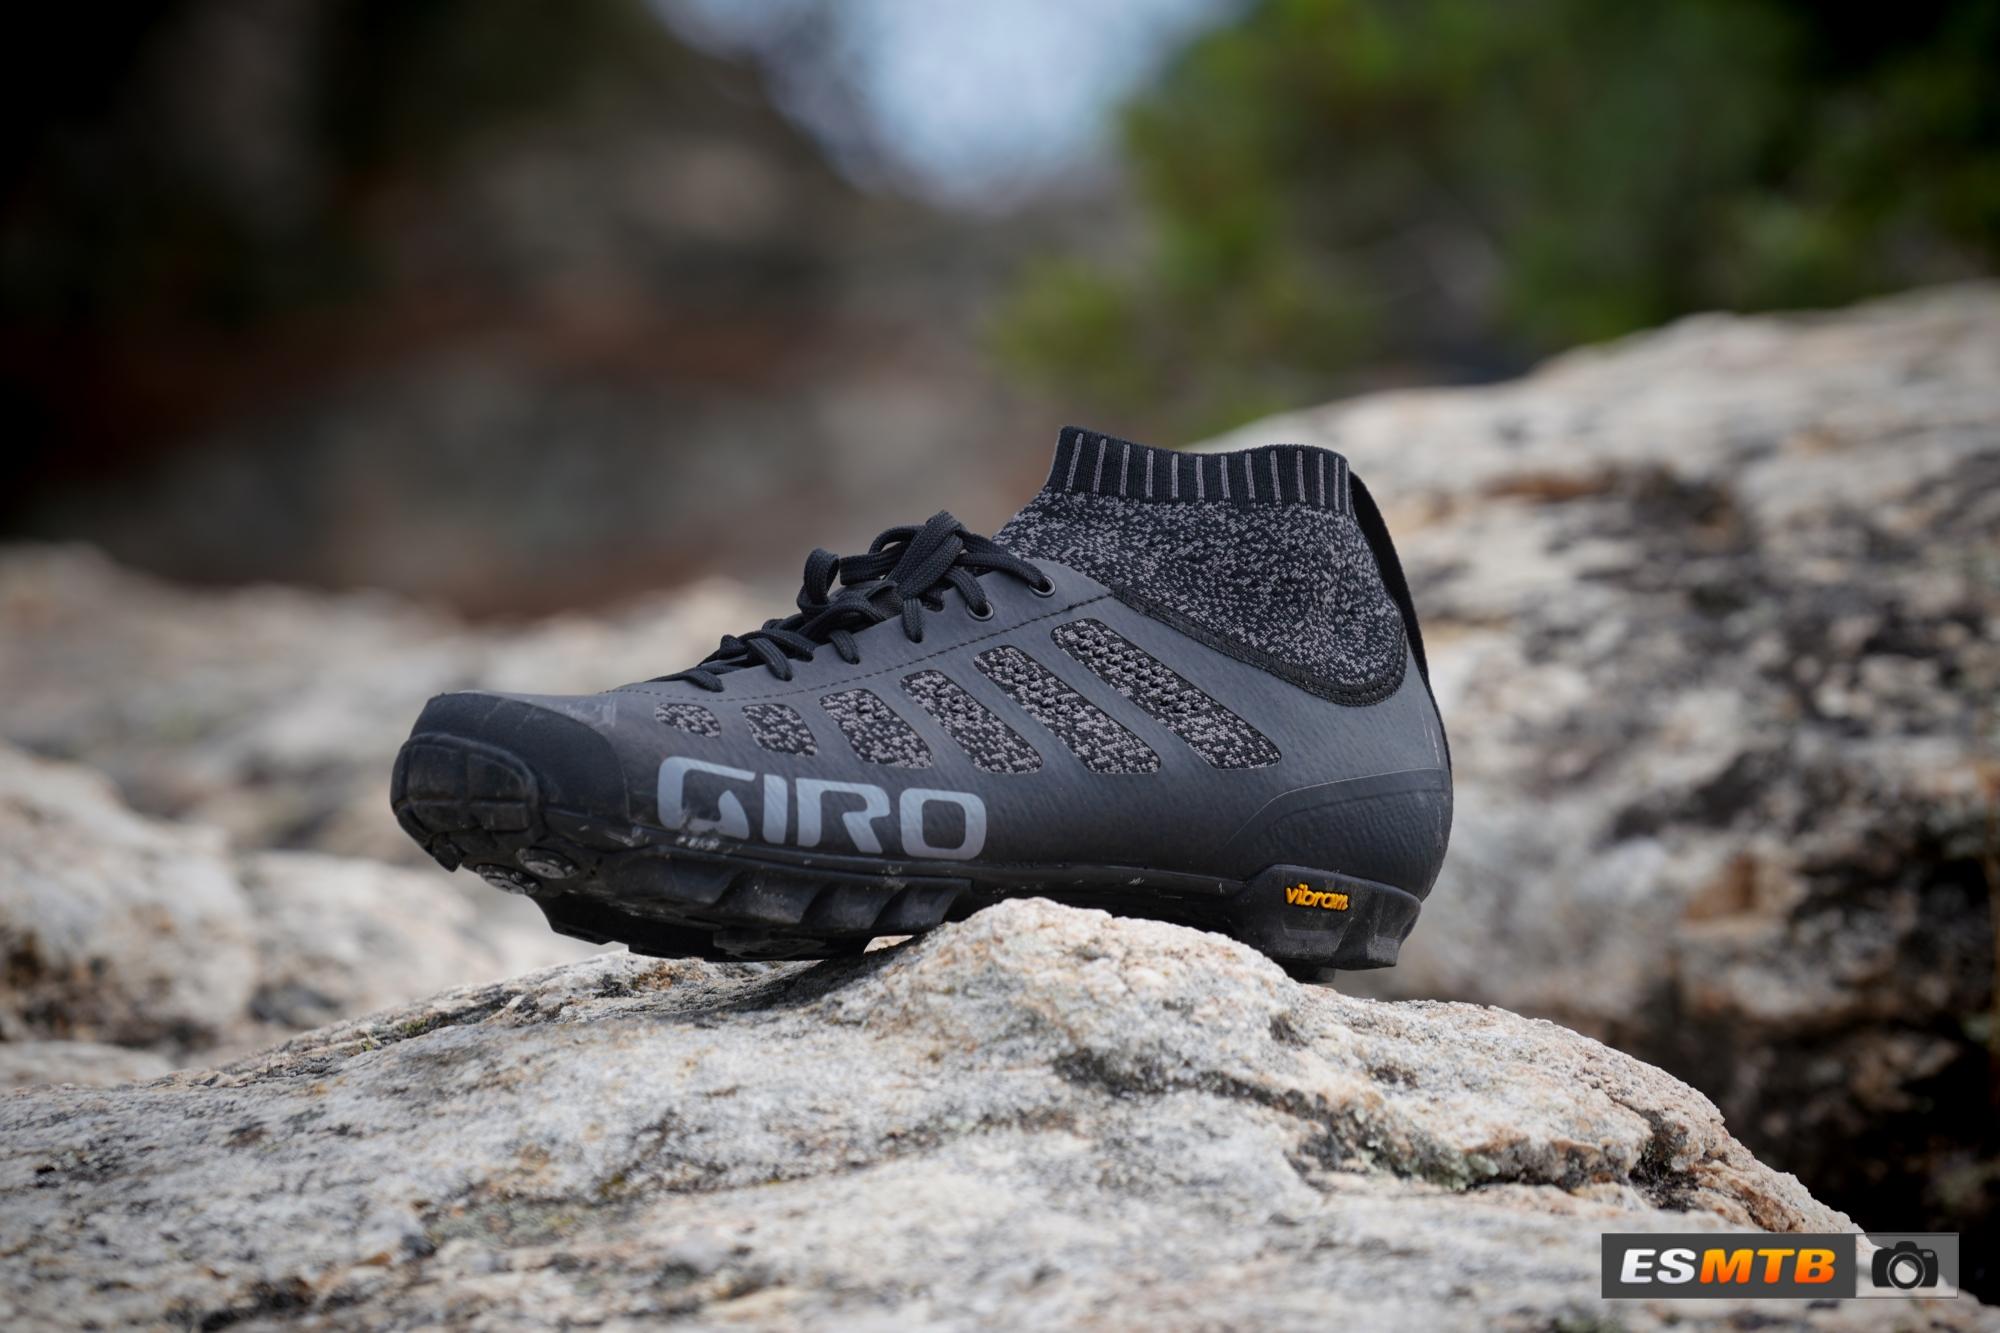 Zapatillas Giro Empire VR70 Knit